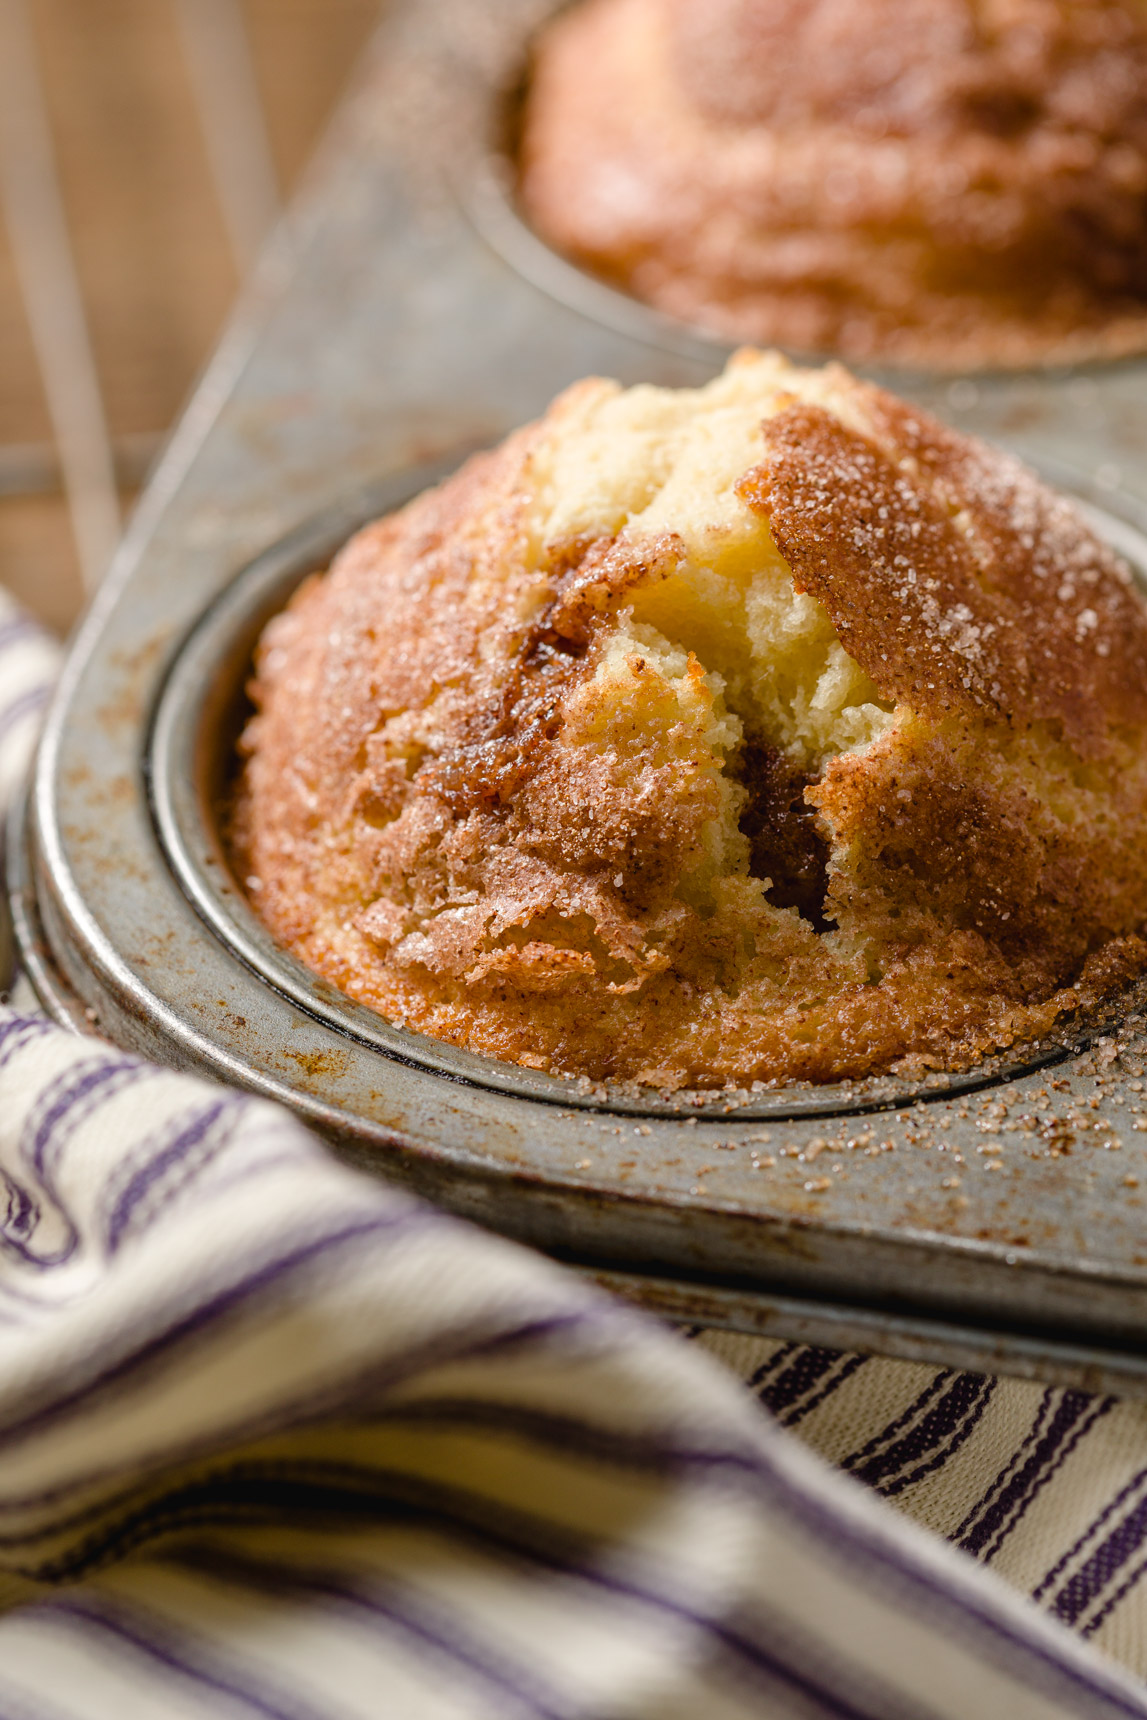 Fresh baked cinnamon muffins